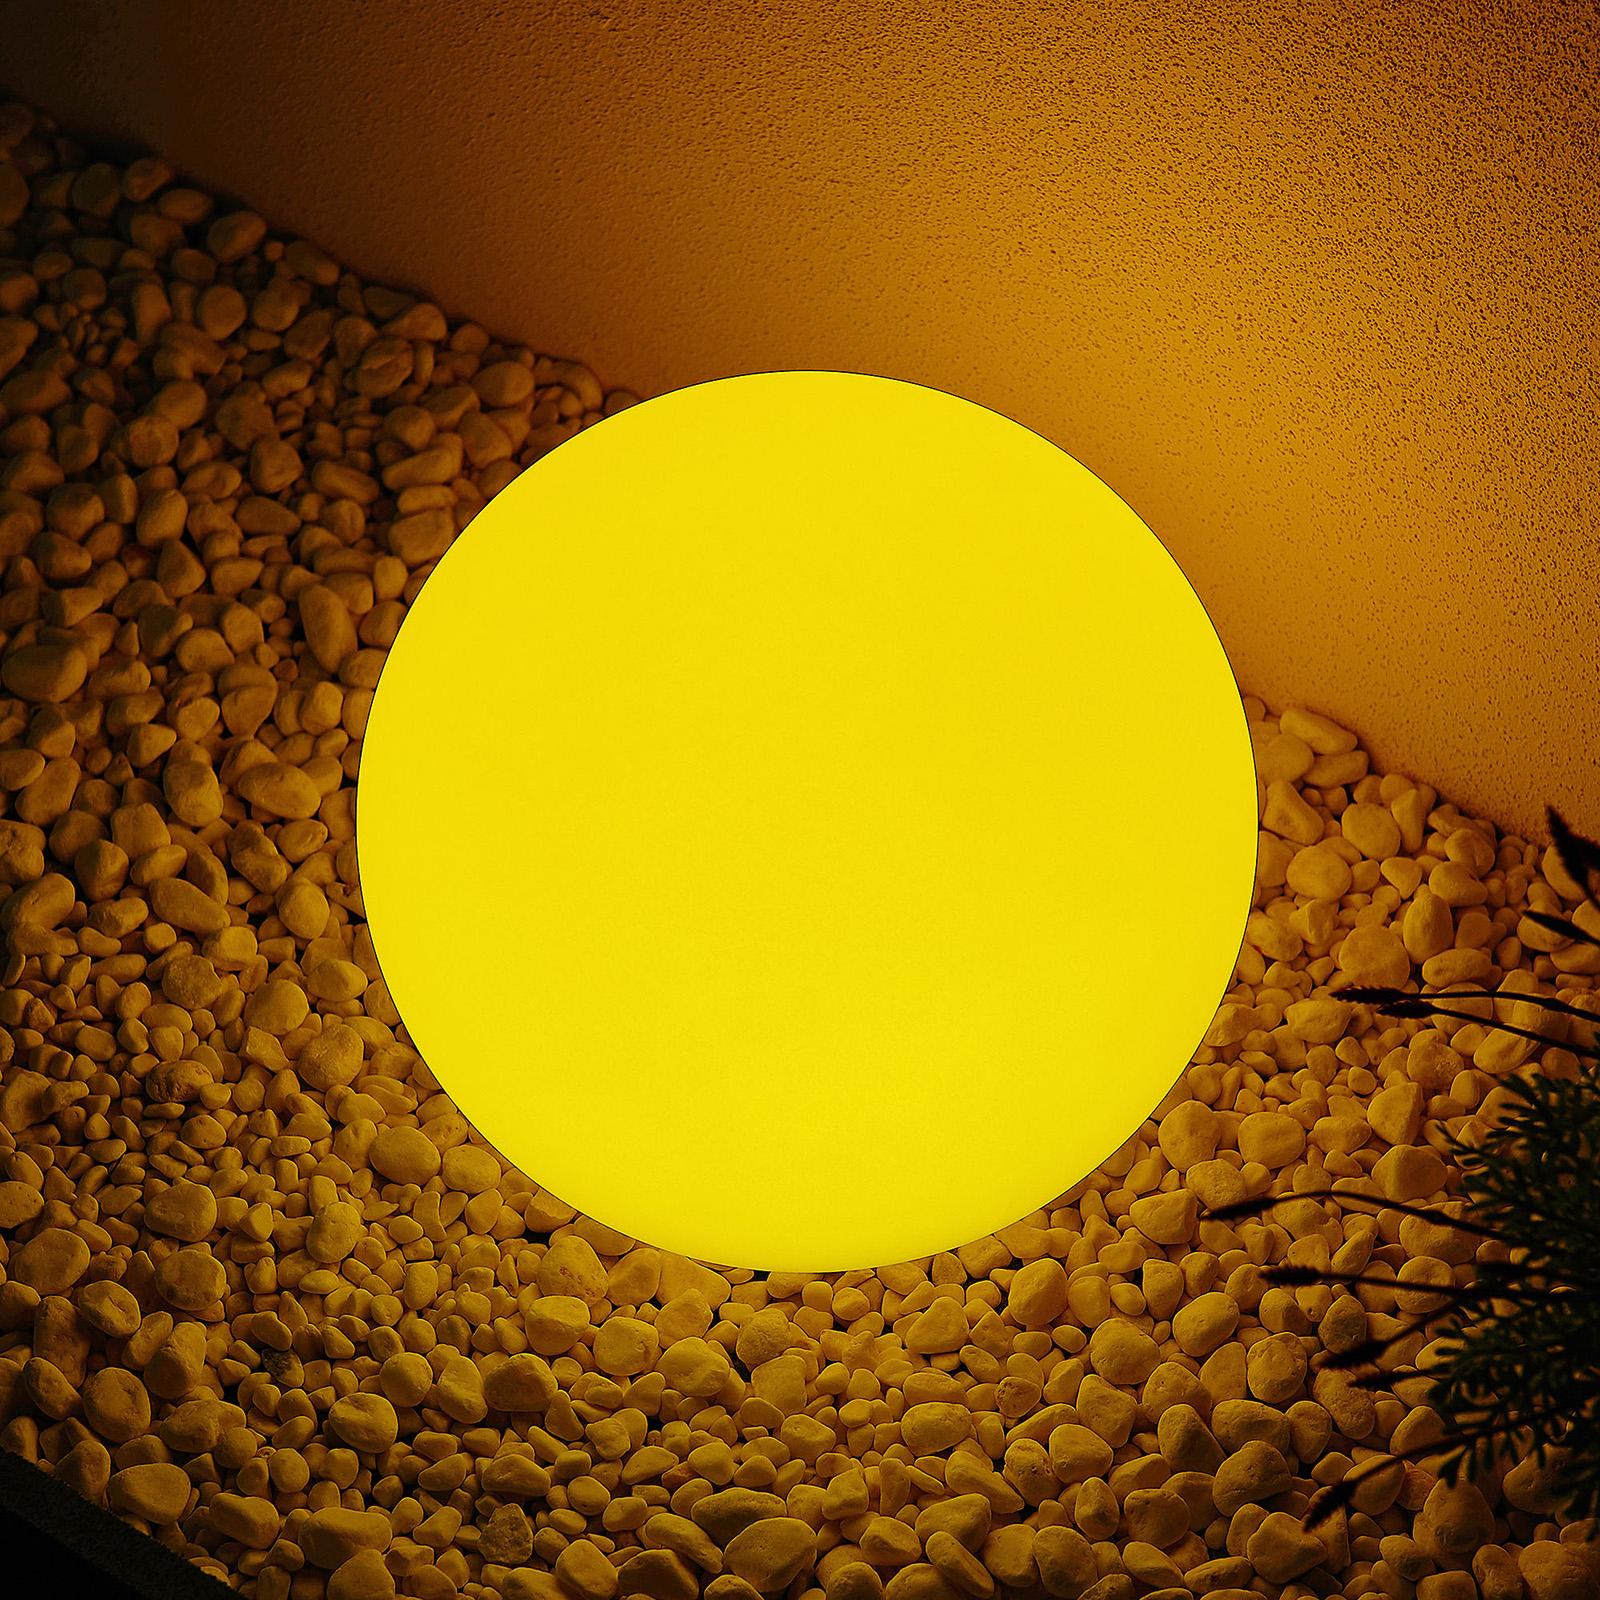 Lindby Yohan RGB-LED-aurinkovalaisin, 30 cm